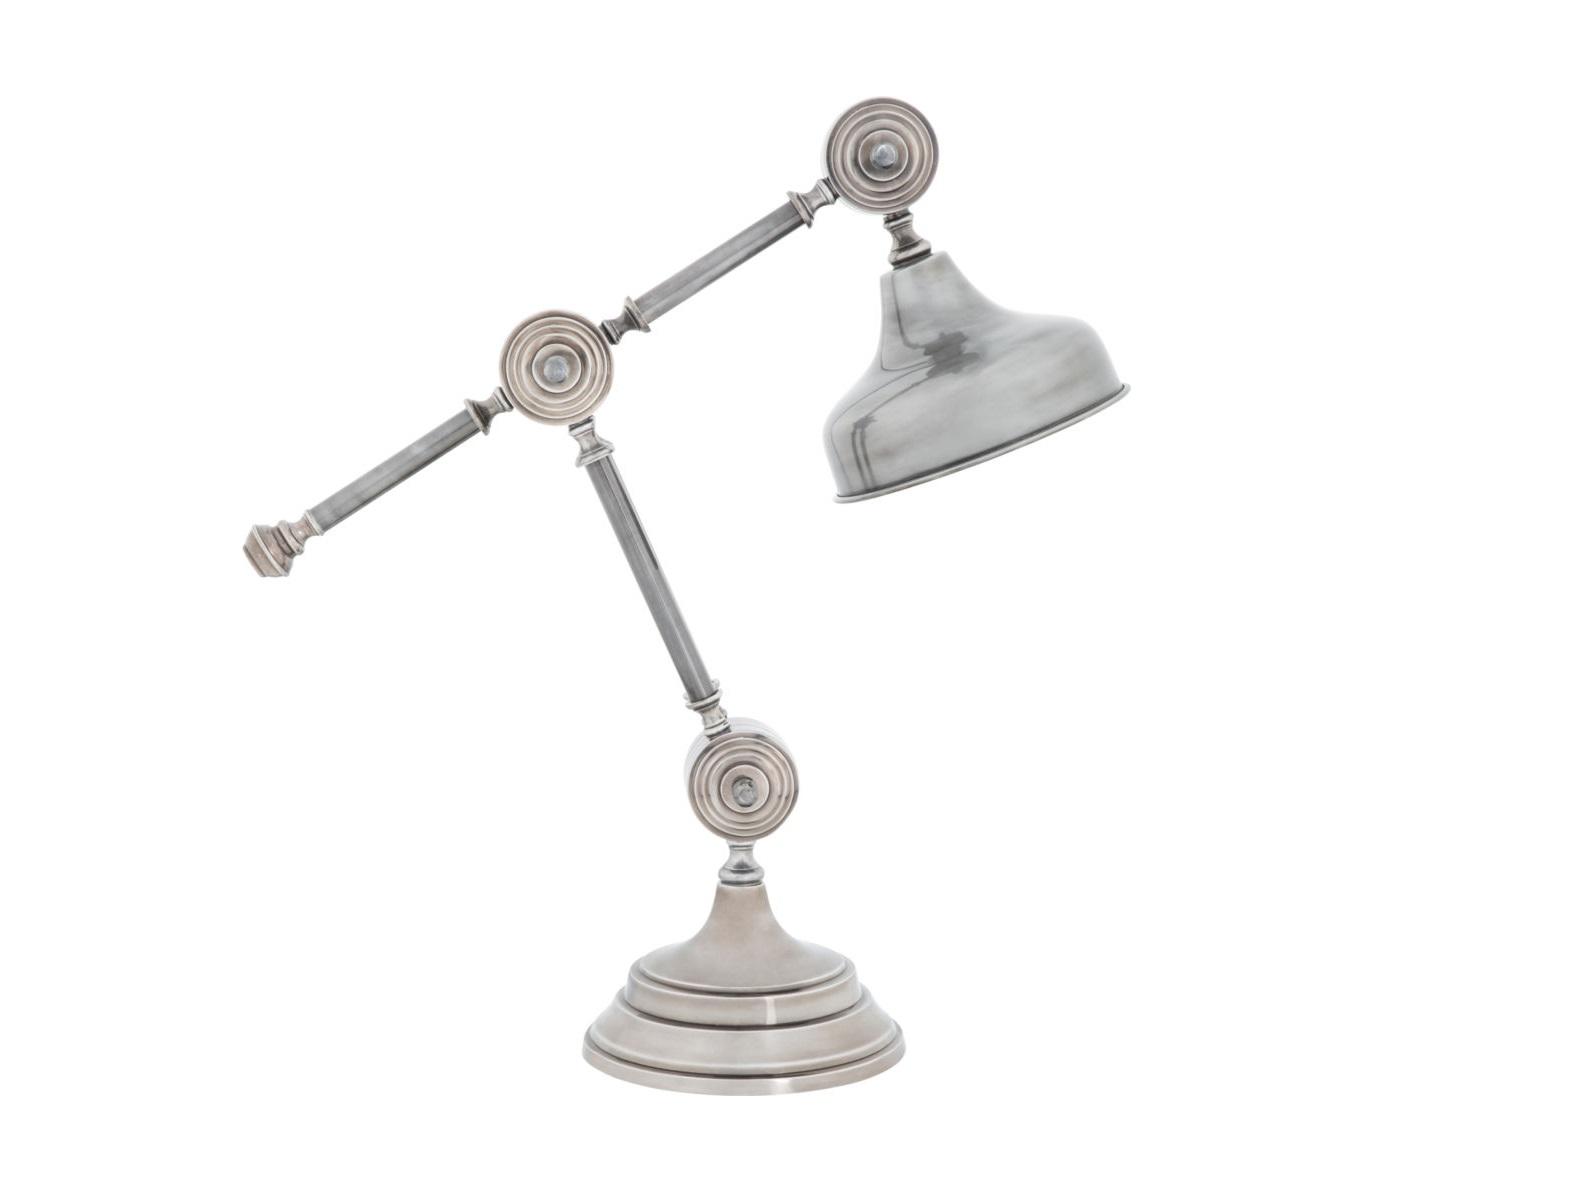 Лампа настольнаяНастольные лампы<br>&amp;lt;div&amp;gt;Вид цоколя: Е27&amp;lt;br&amp;gt;&amp;lt;/div&amp;gt;&amp;lt;div&amp;gt;Мощность: 40W&amp;lt;/div&amp;gt;&amp;lt;div&amp;gt;Количество ламп: 1&amp;amp;nbsp;(нет в комплекте)&amp;lt;/div&amp;gt;&amp;lt;div&amp;gt;&amp;lt;br&amp;gt;&amp;lt;/div&amp;gt;<br><br>Material: Алюминий<br>Width см: 22<br>Depth см: 61<br>Height см: 69